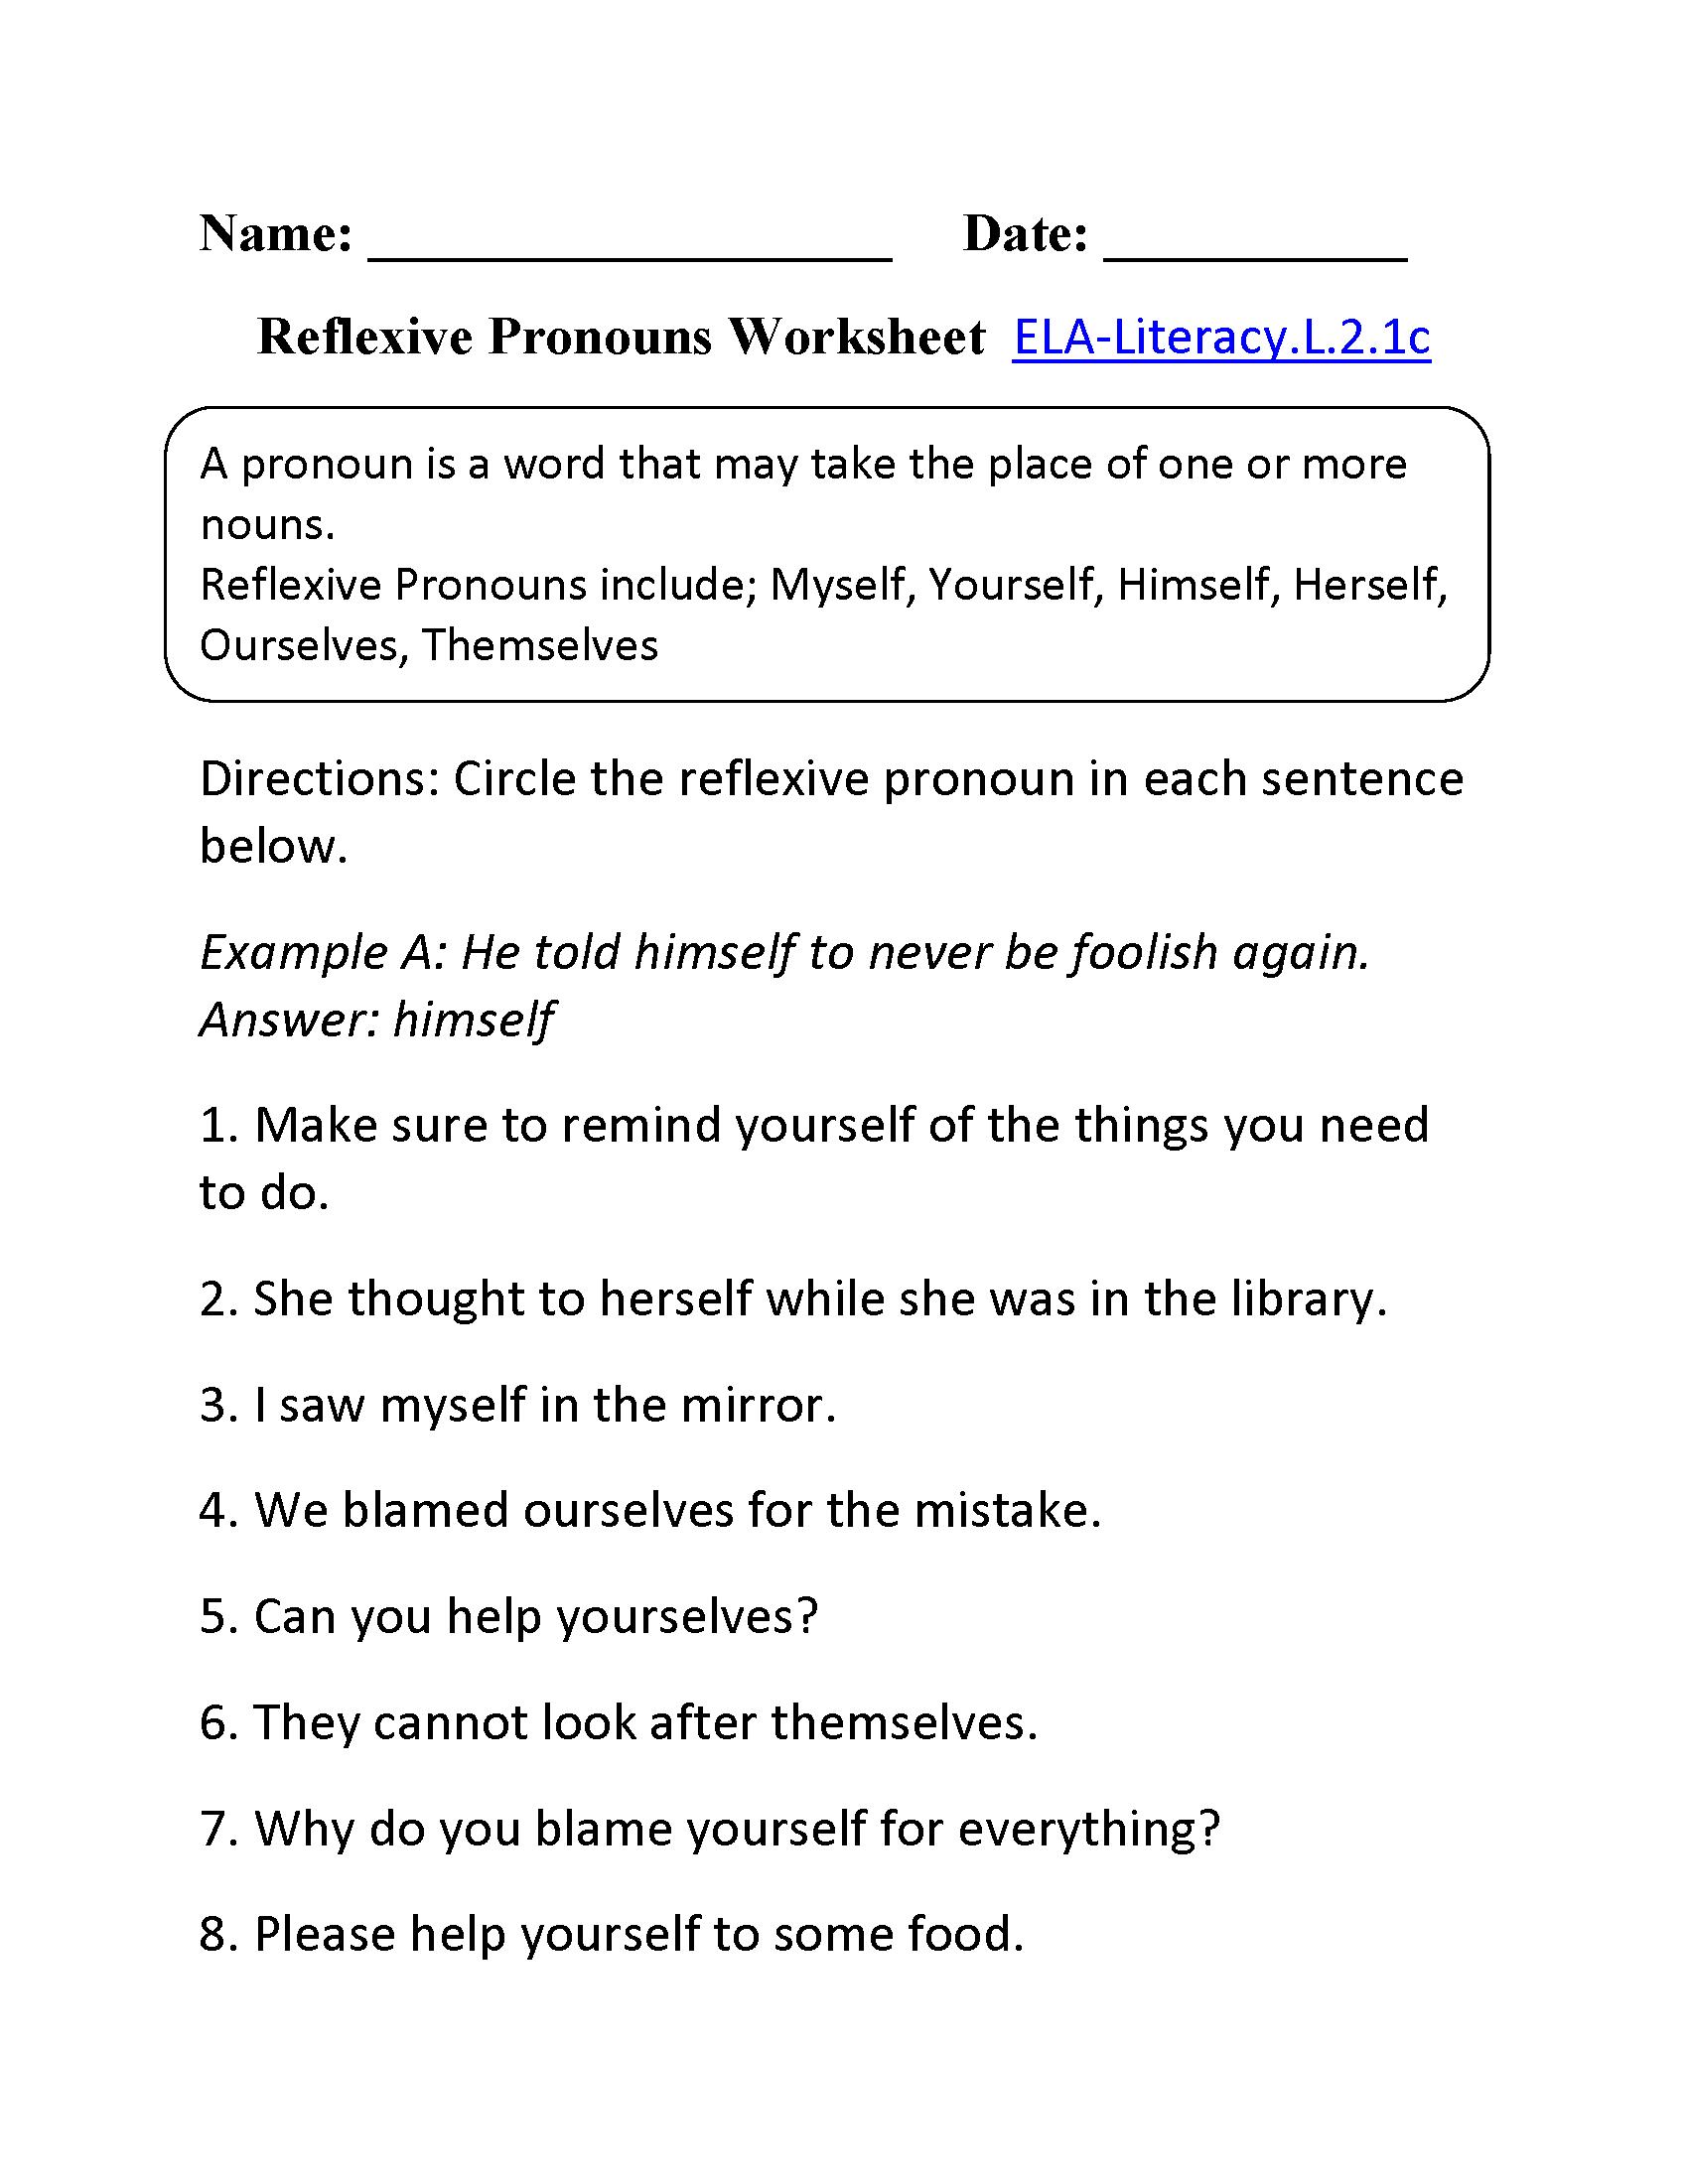 Reflexive Pronouns Worksheet 1 ELA Literacy L 2 1c Language